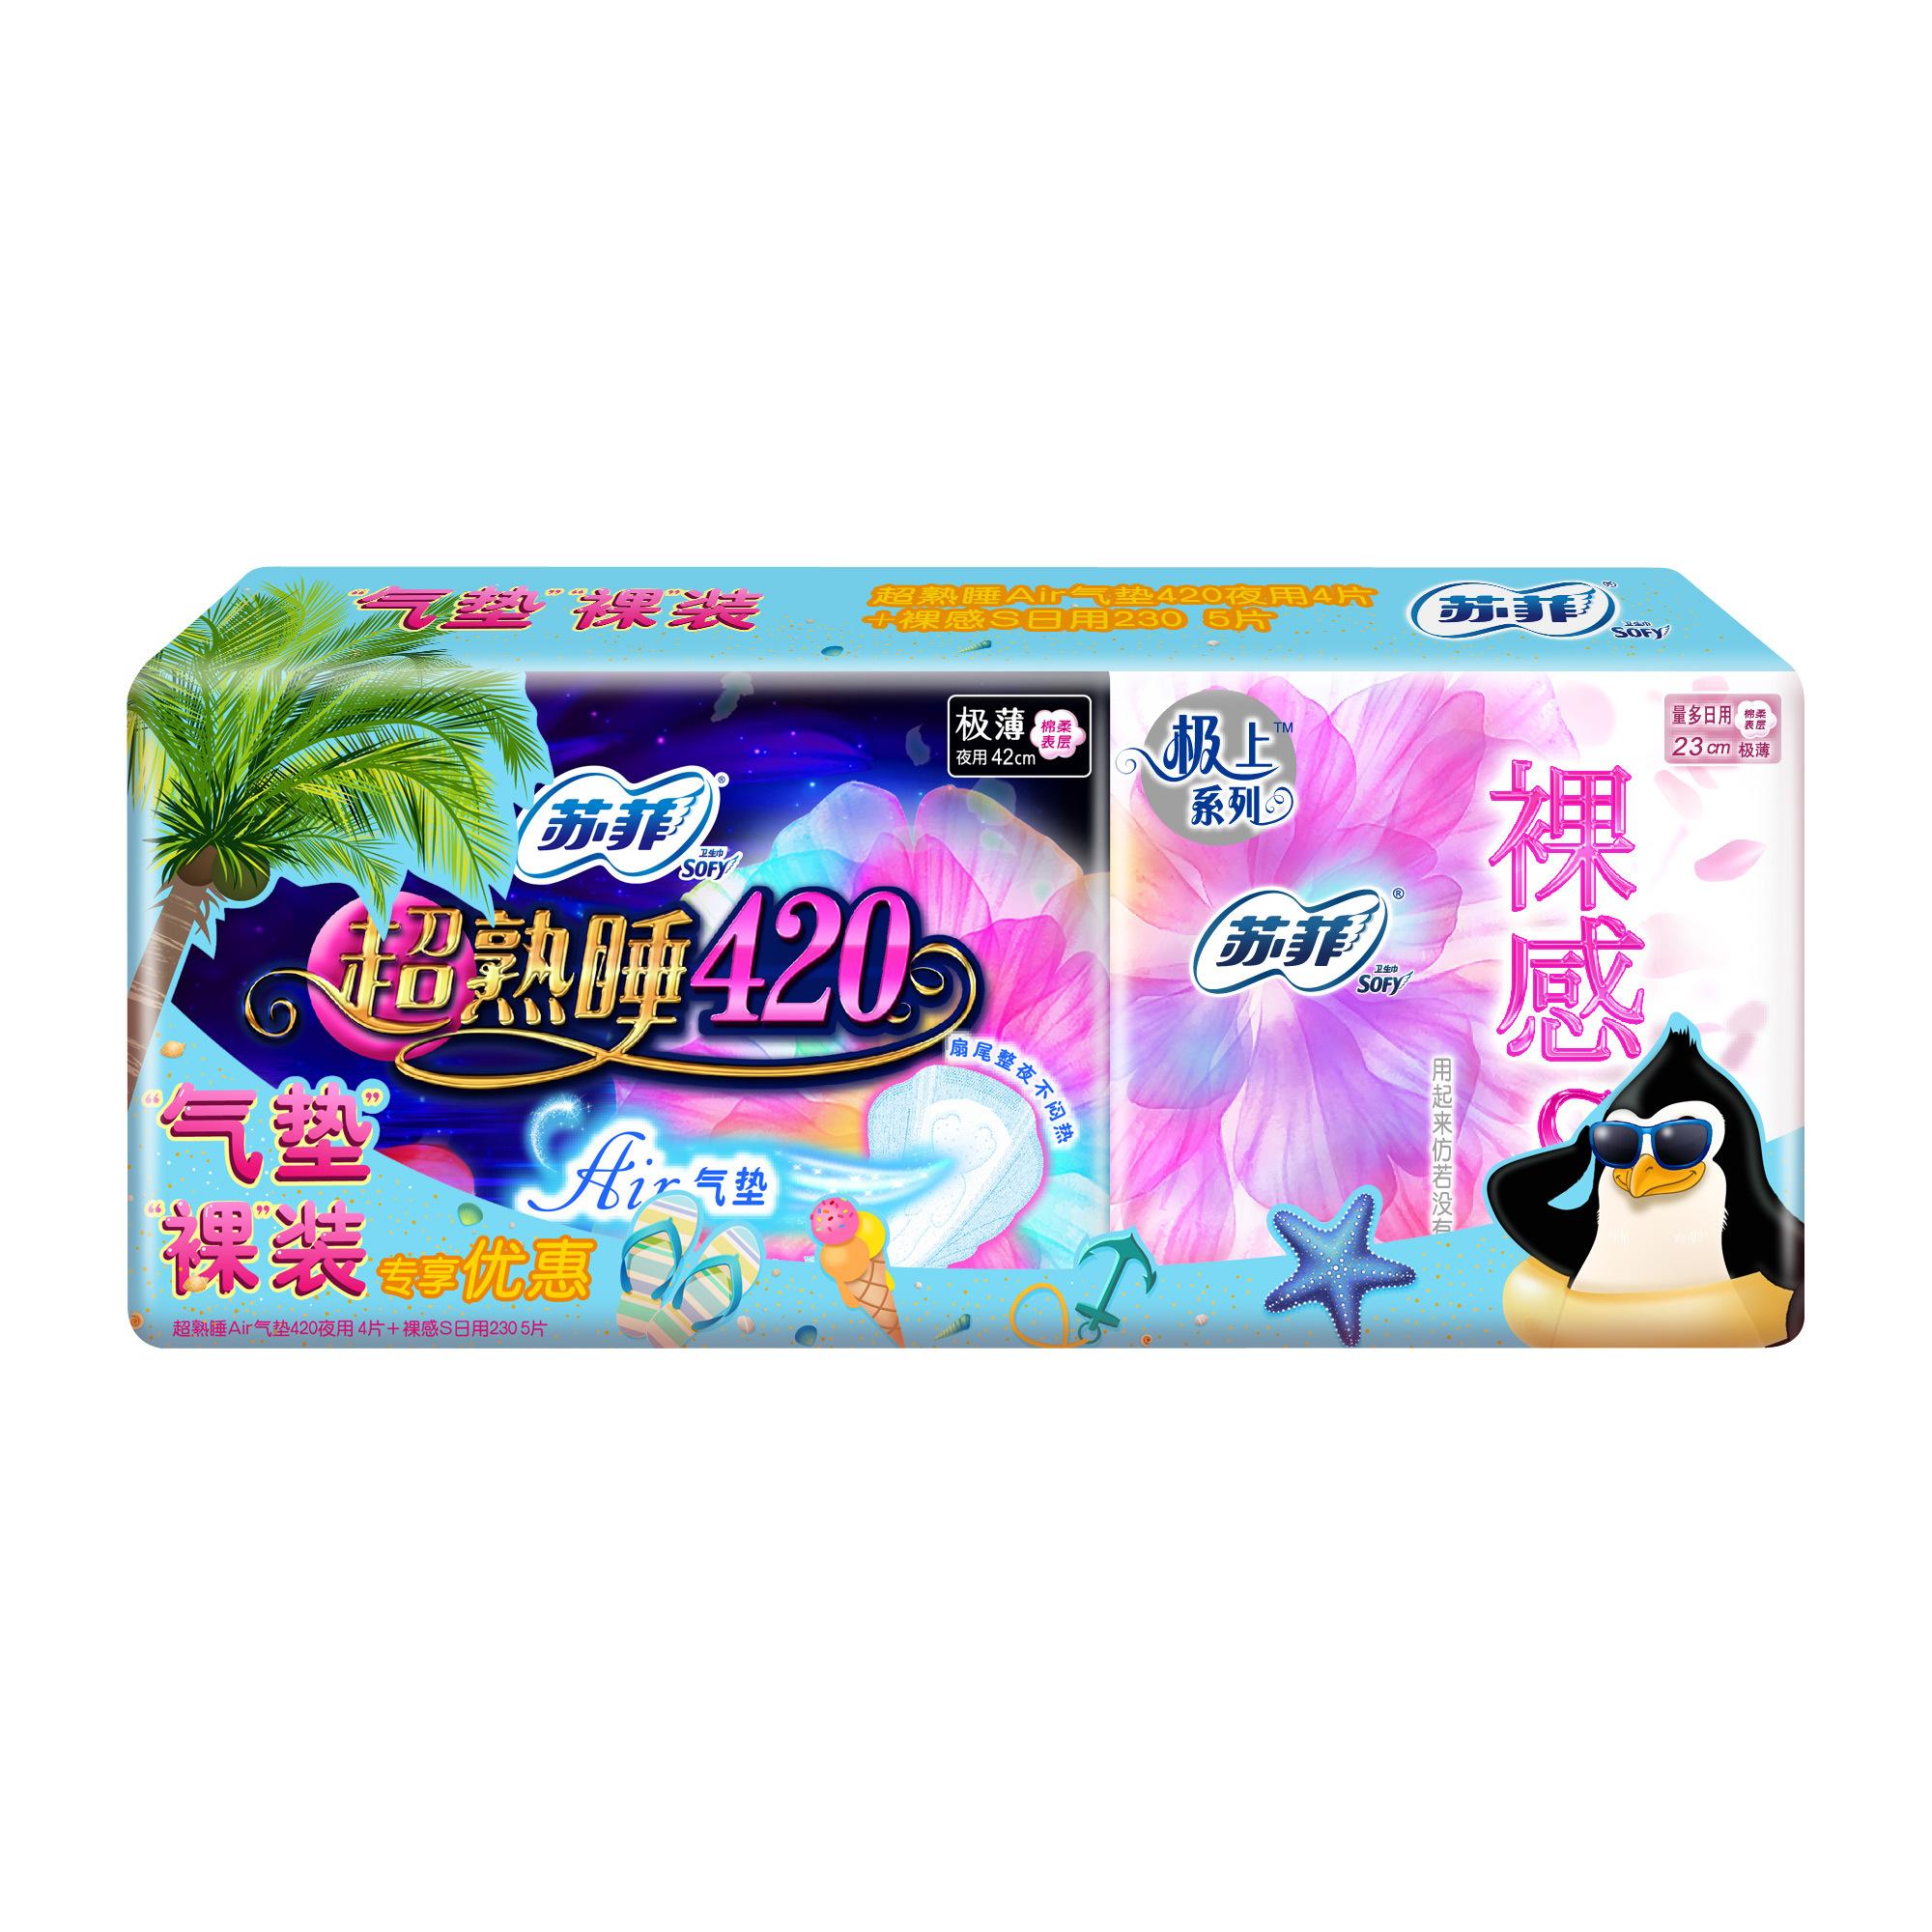 SOFY 蘇菲 超熟睡Air氣墊夜用420mm^~4片 裸感S日用衛生巾230mm^~ 5